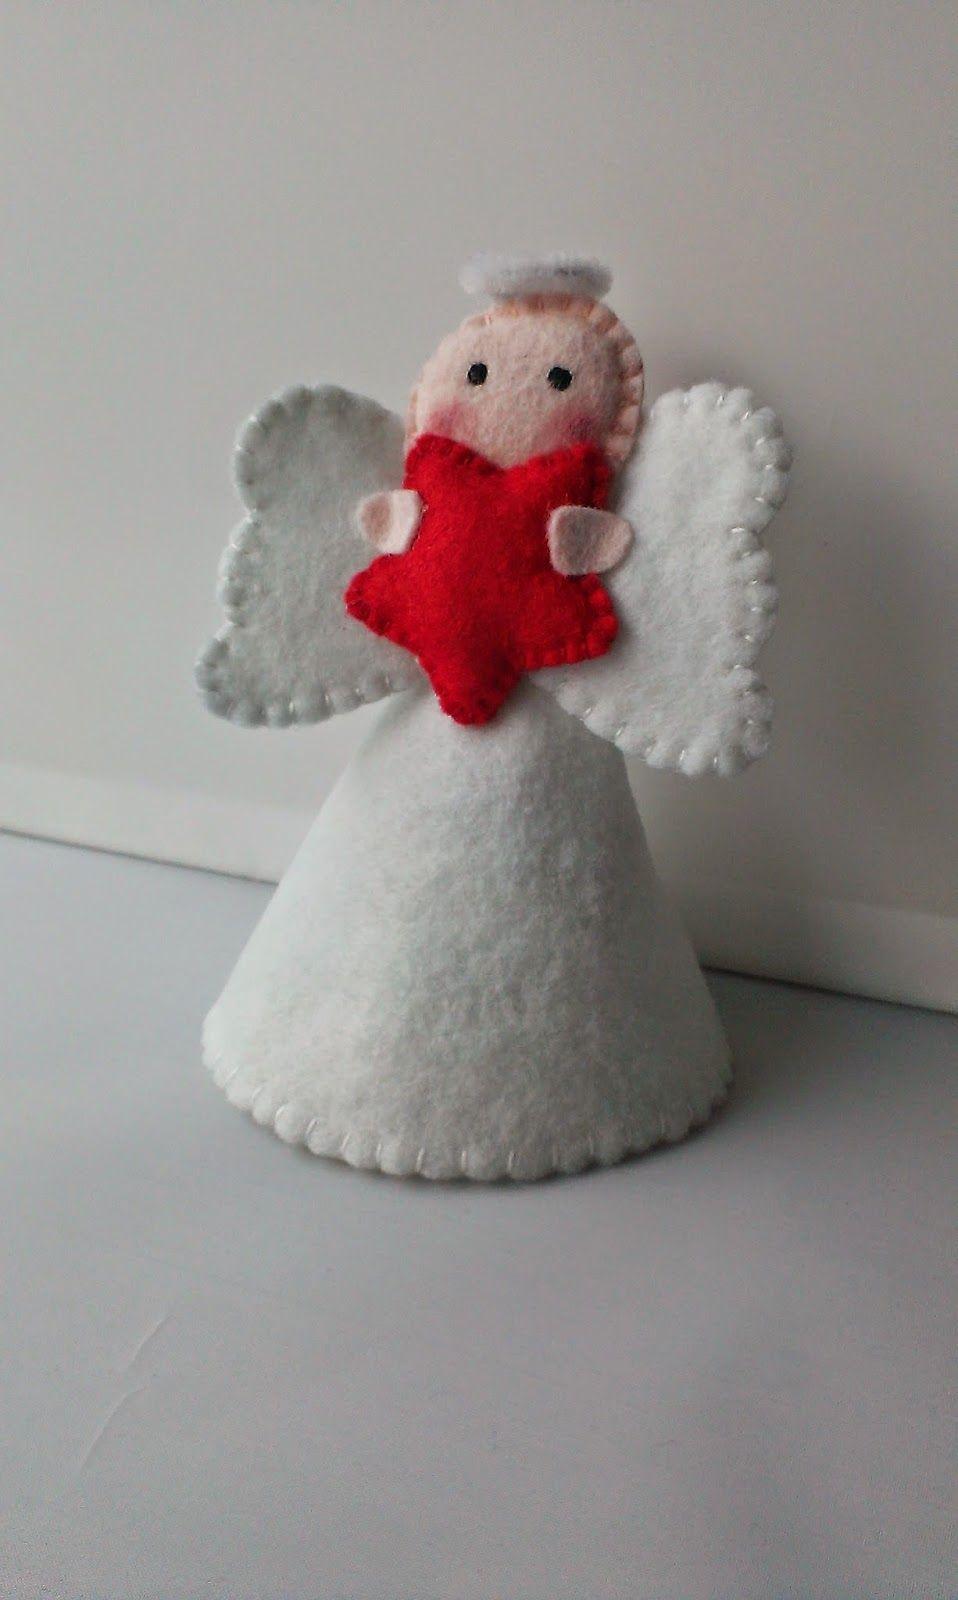 Felt Angel Christmas Tree Topper By Grace S Favours Diy Christmas Angel Tree Topper Diy Christmas Tree Topper Felt Christmas Decorations